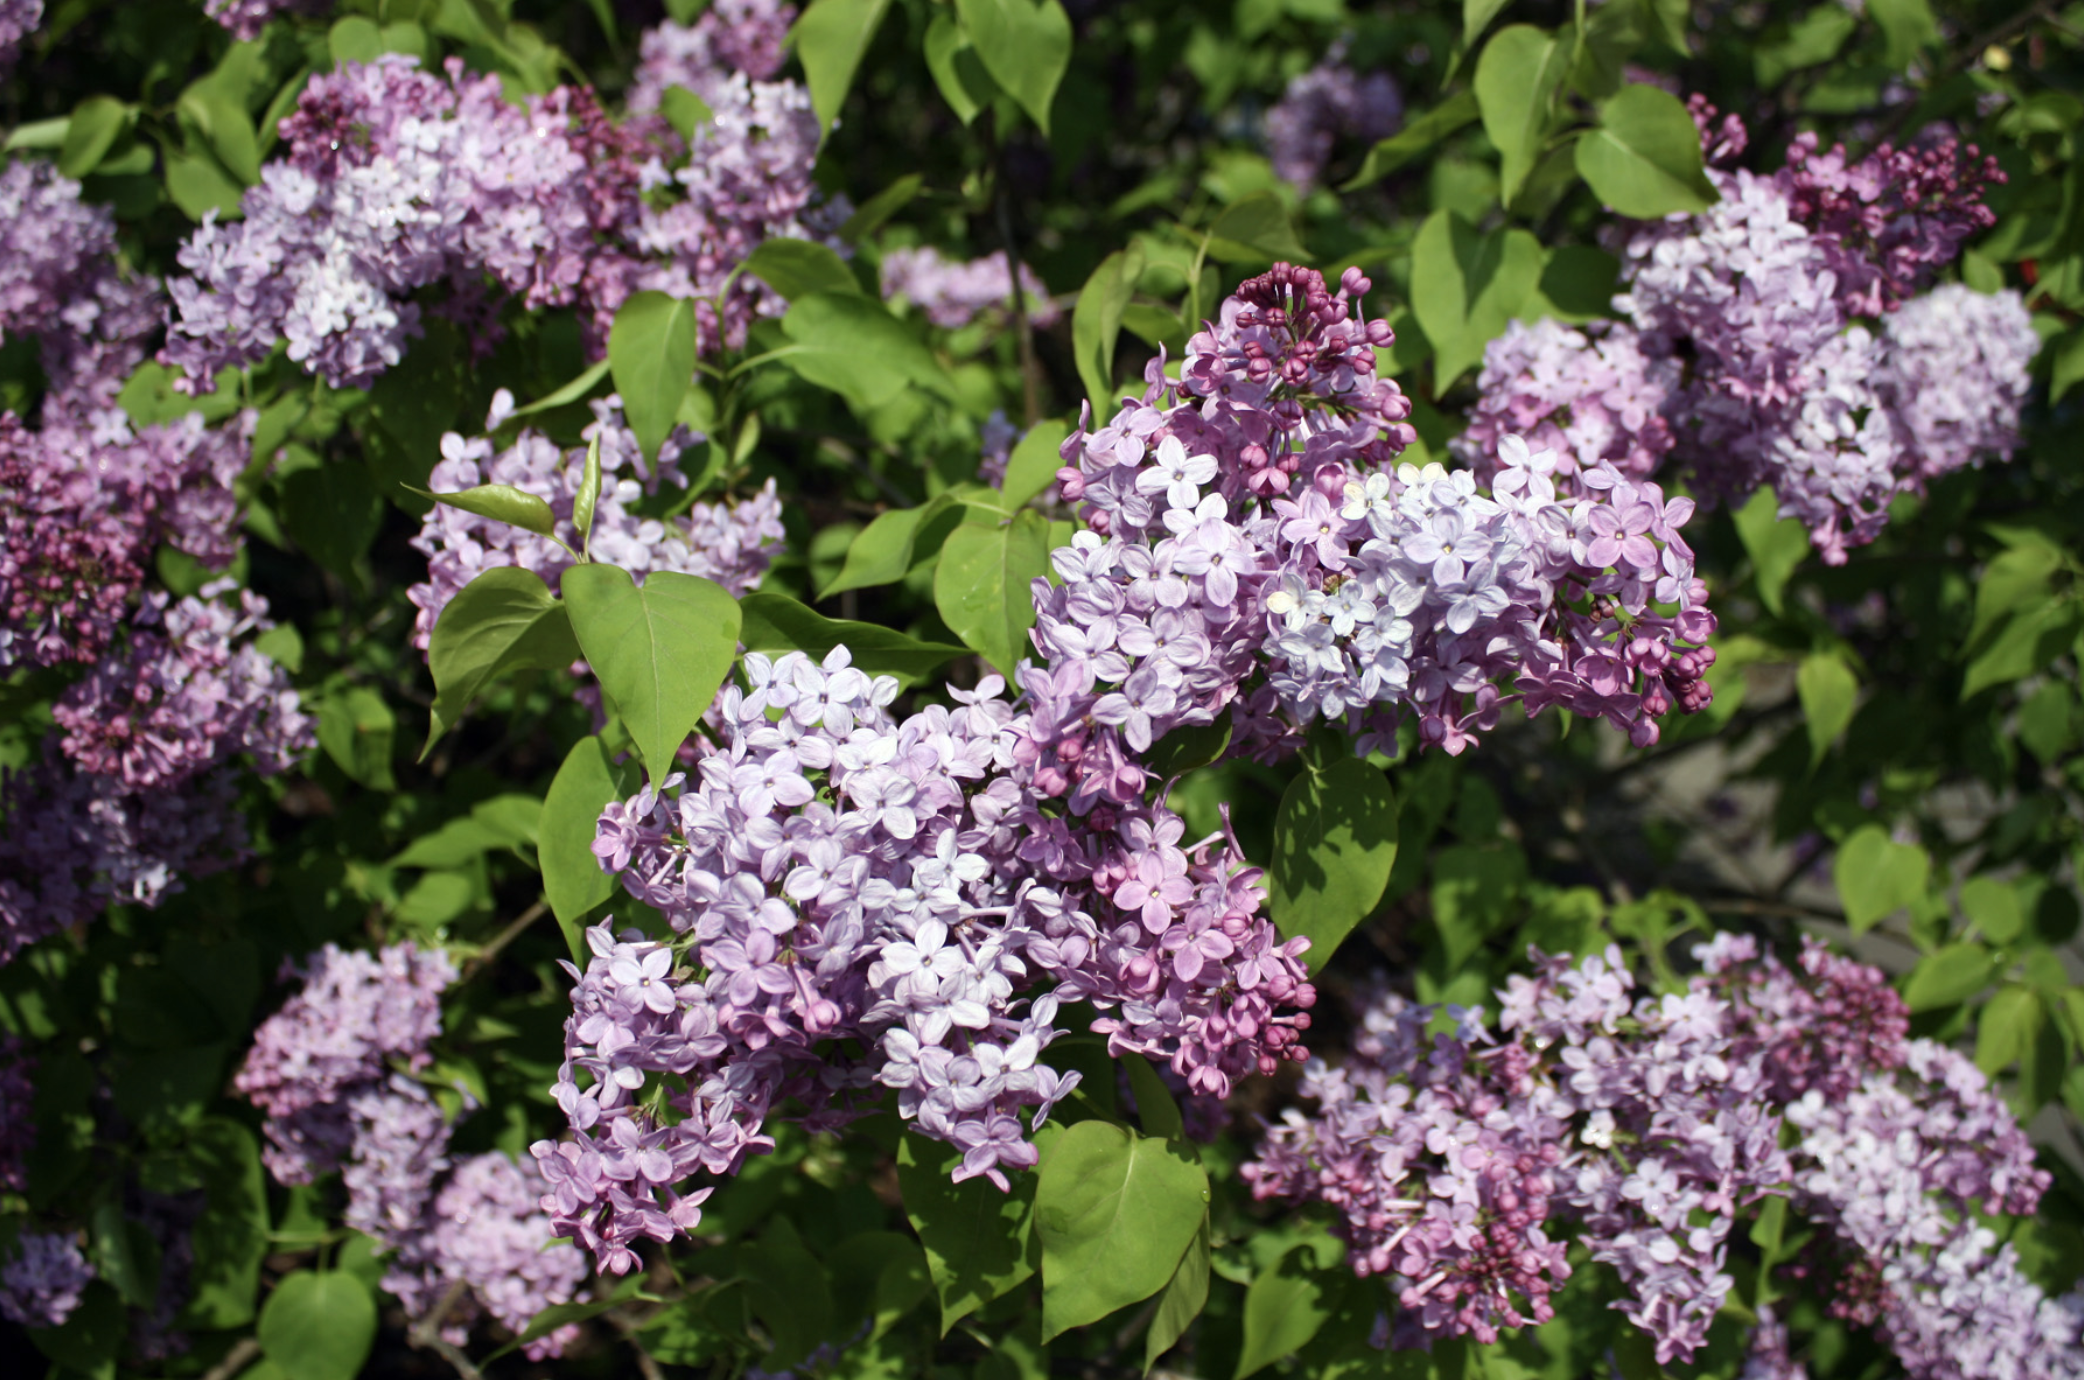 Lilacs Light Up the Arboretum